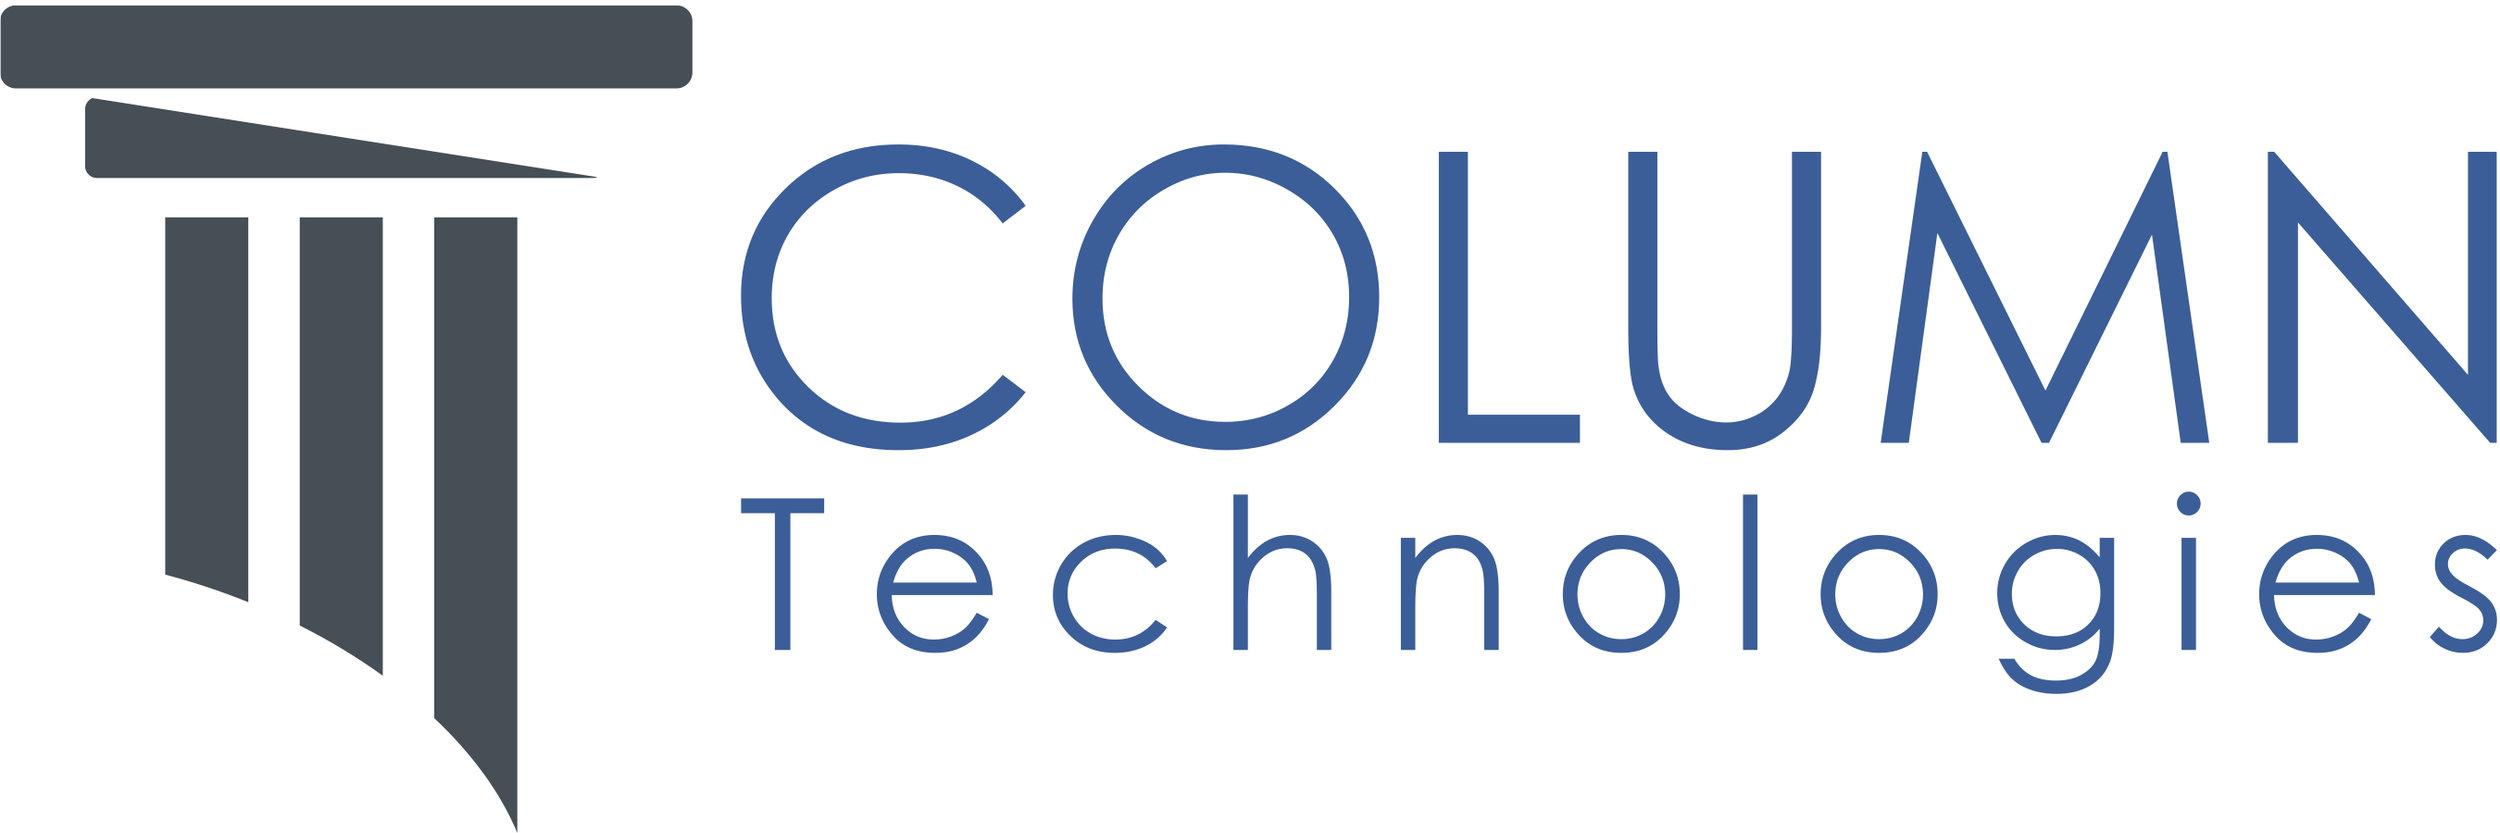 logo-Blue (1).jpg